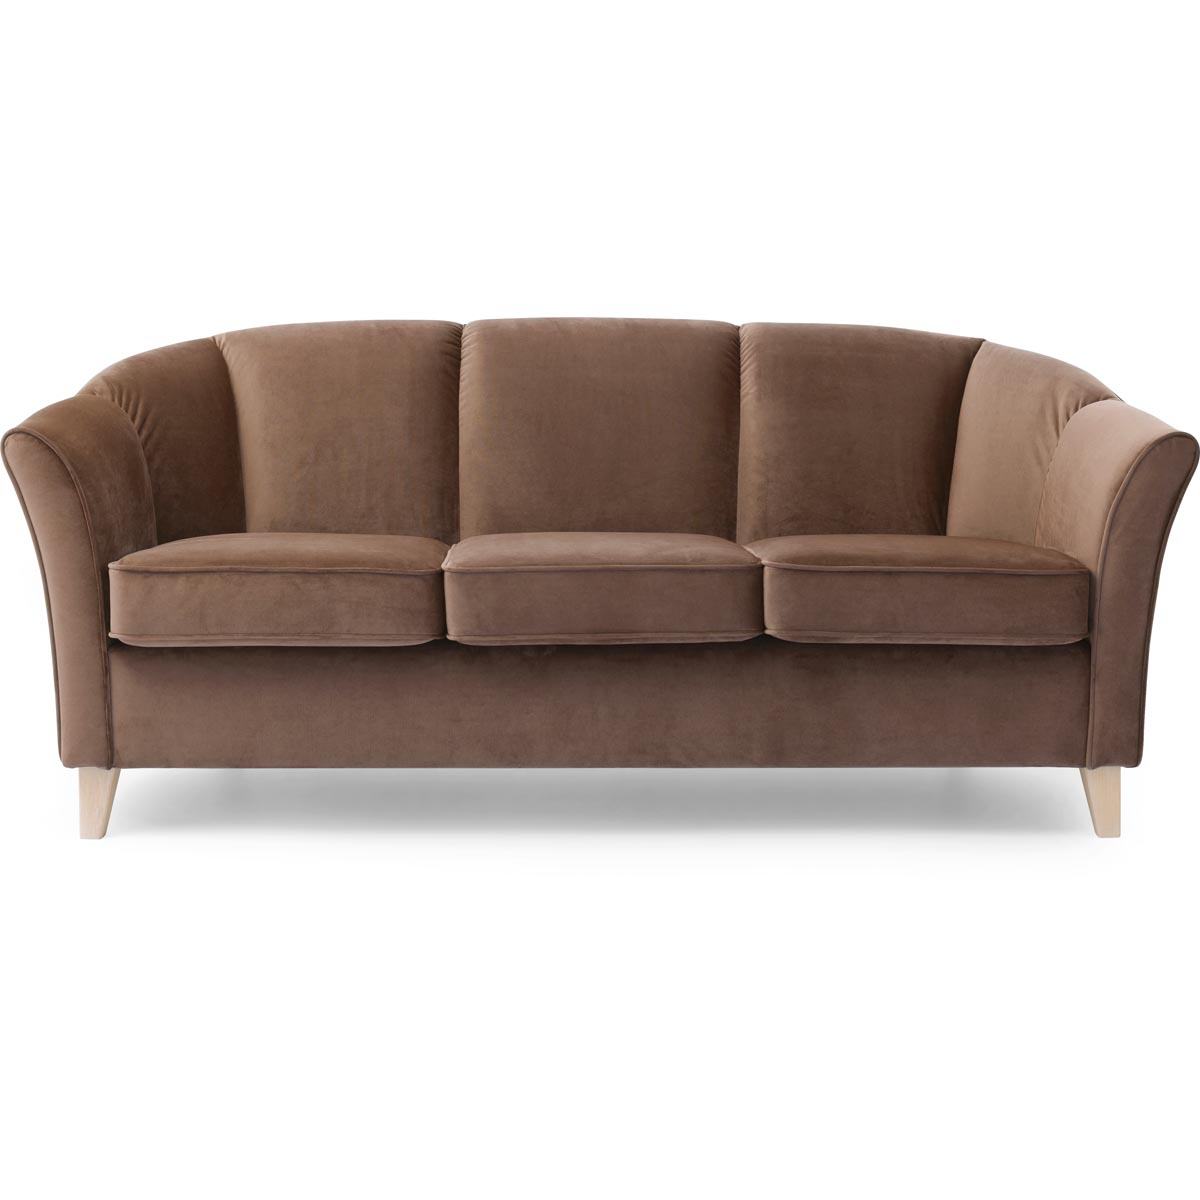 Ekerö soffa 3-sits tyg Monolith 15 mullvad